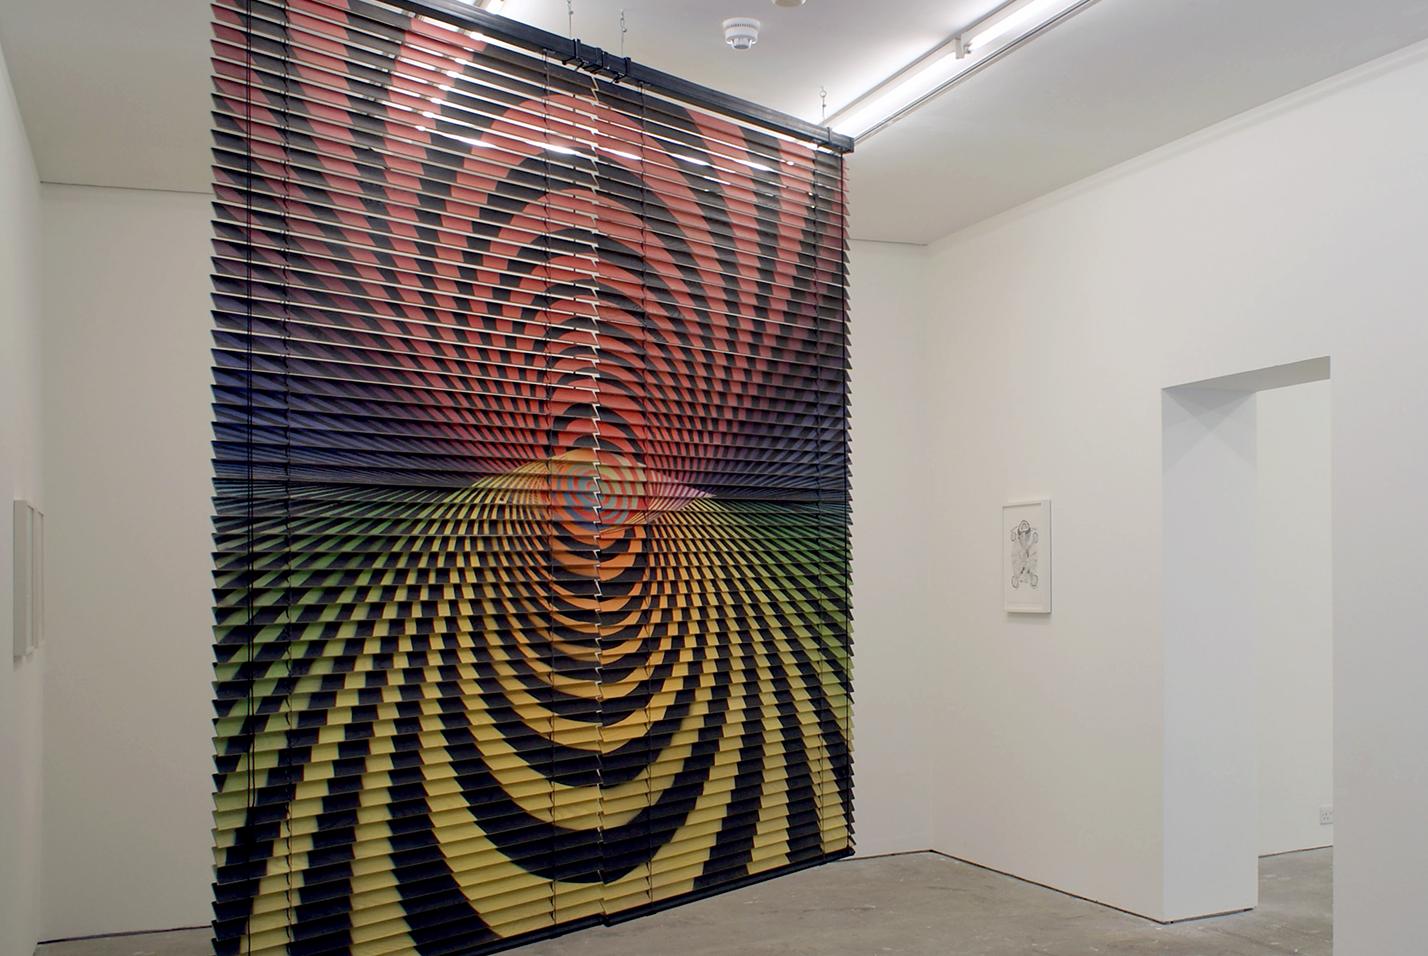 Chris Evans, *Repeat Horizon*, airbrush on oak slats, 2007.